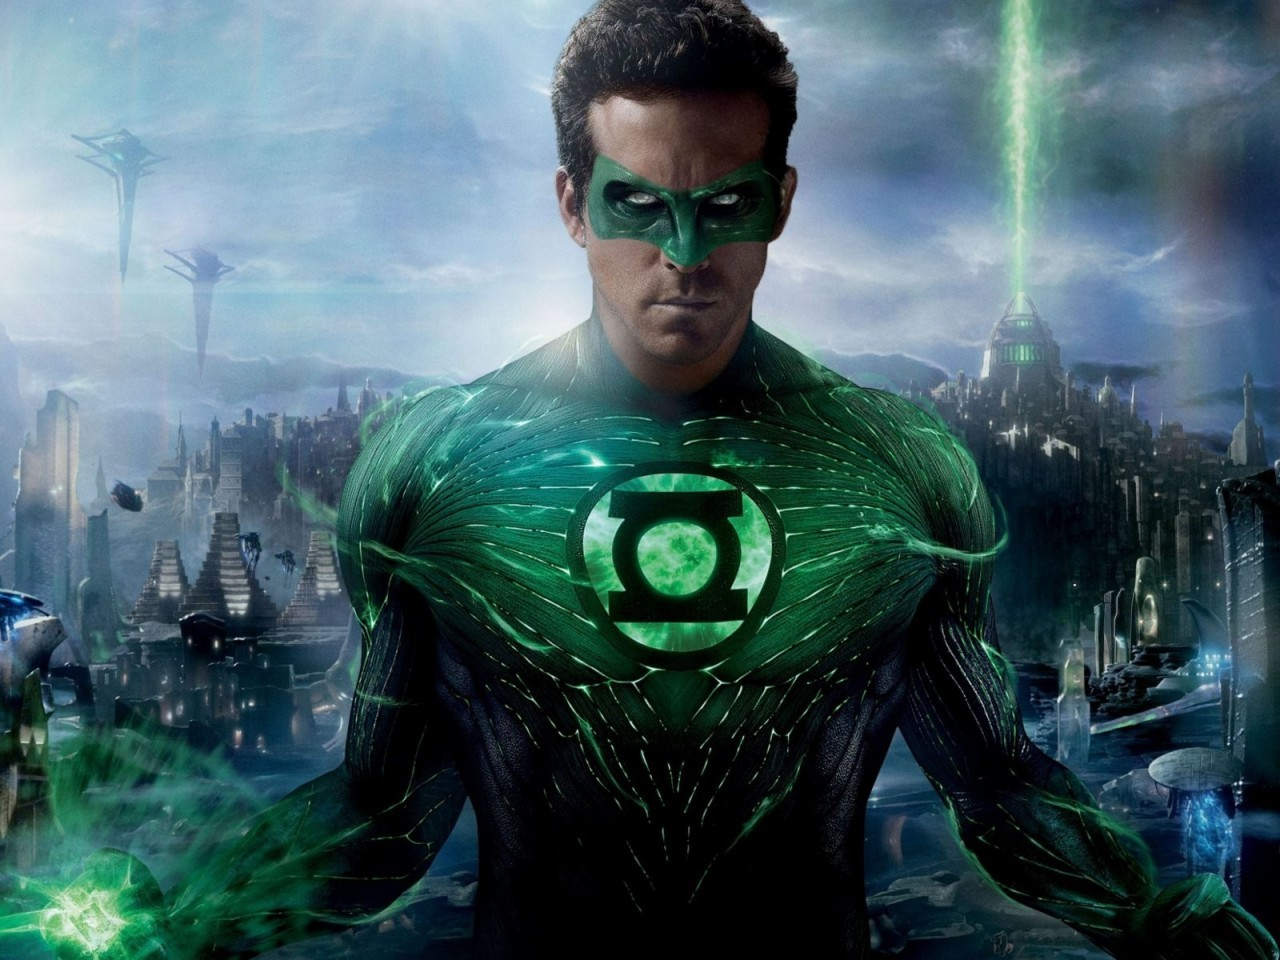 13808 download wallpaper Cinema, People, Actors, Men, Green Lantern, Ryan Reynolds screensavers and pictures for free